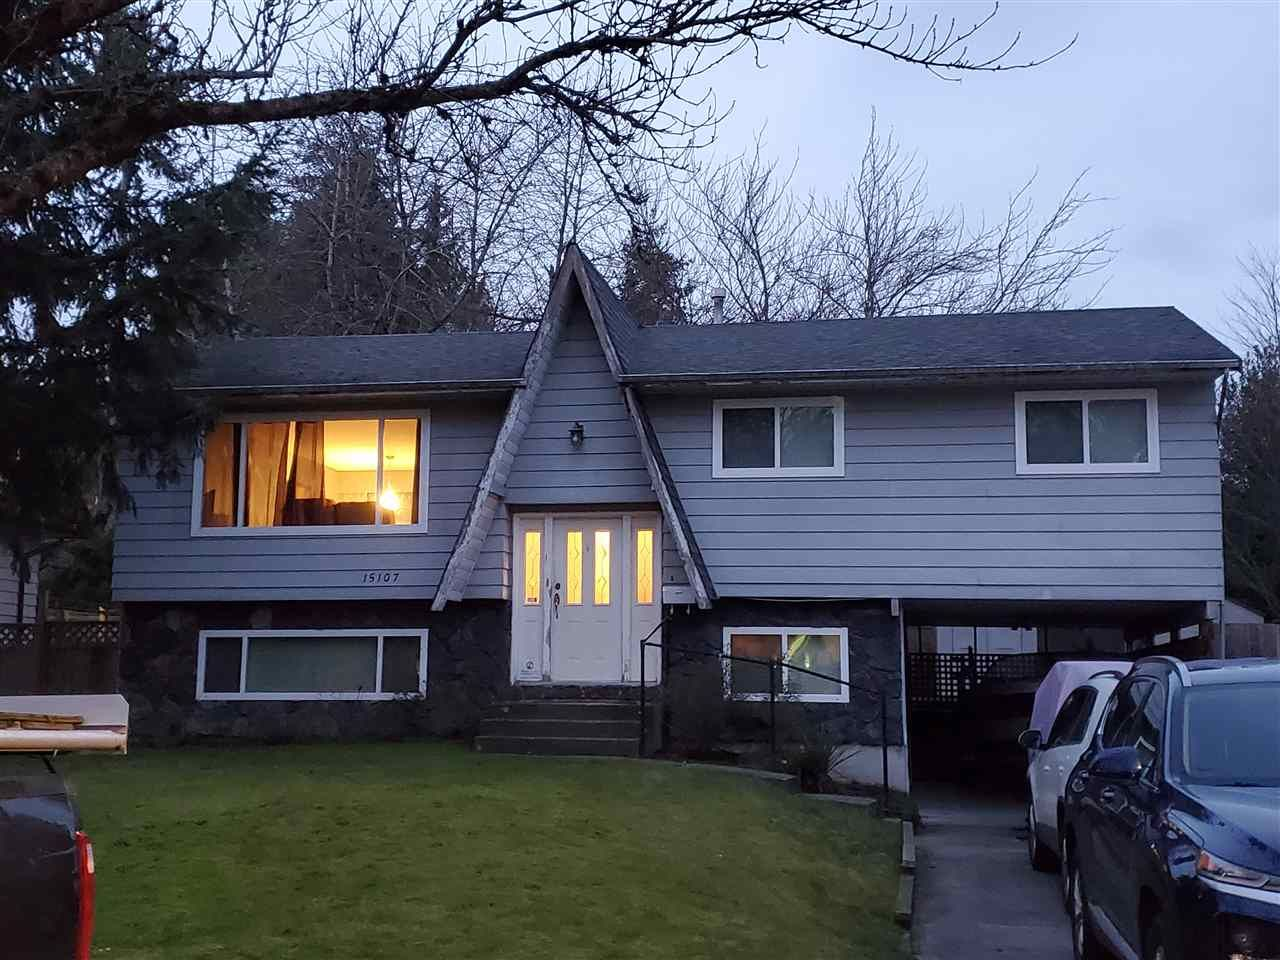 Main Photo: 15107 86B Avenue in Surrey: Bear Creek Green Timbers House for sale : MLS®# R2535064